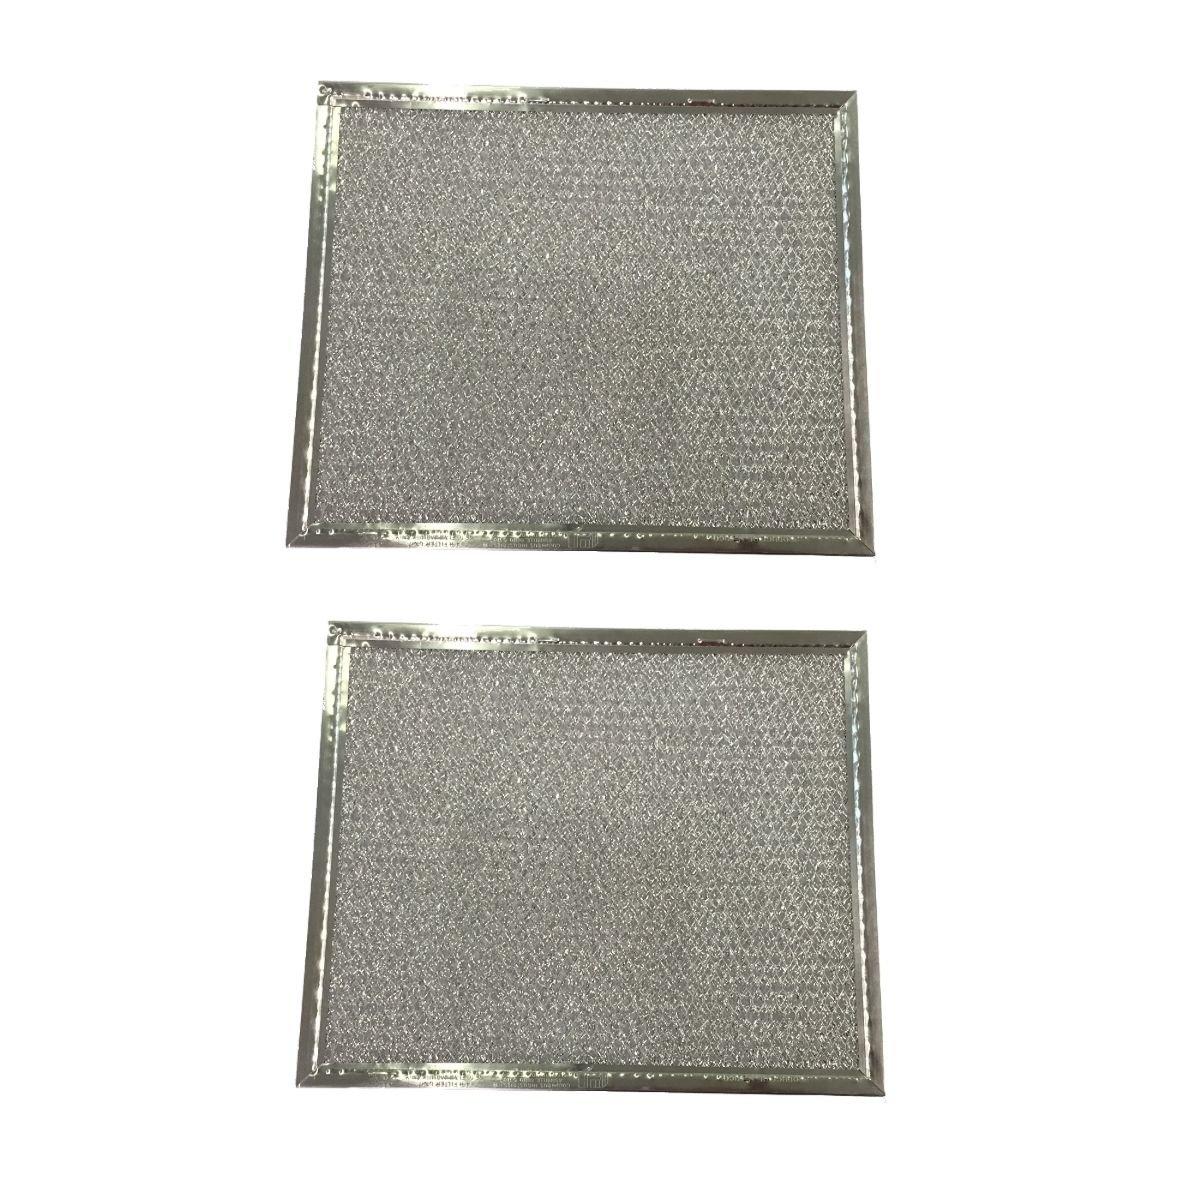 (2) Range Hood Vent Grease Filter 8 x 9.5 x 3/32 Aluminum - NEW